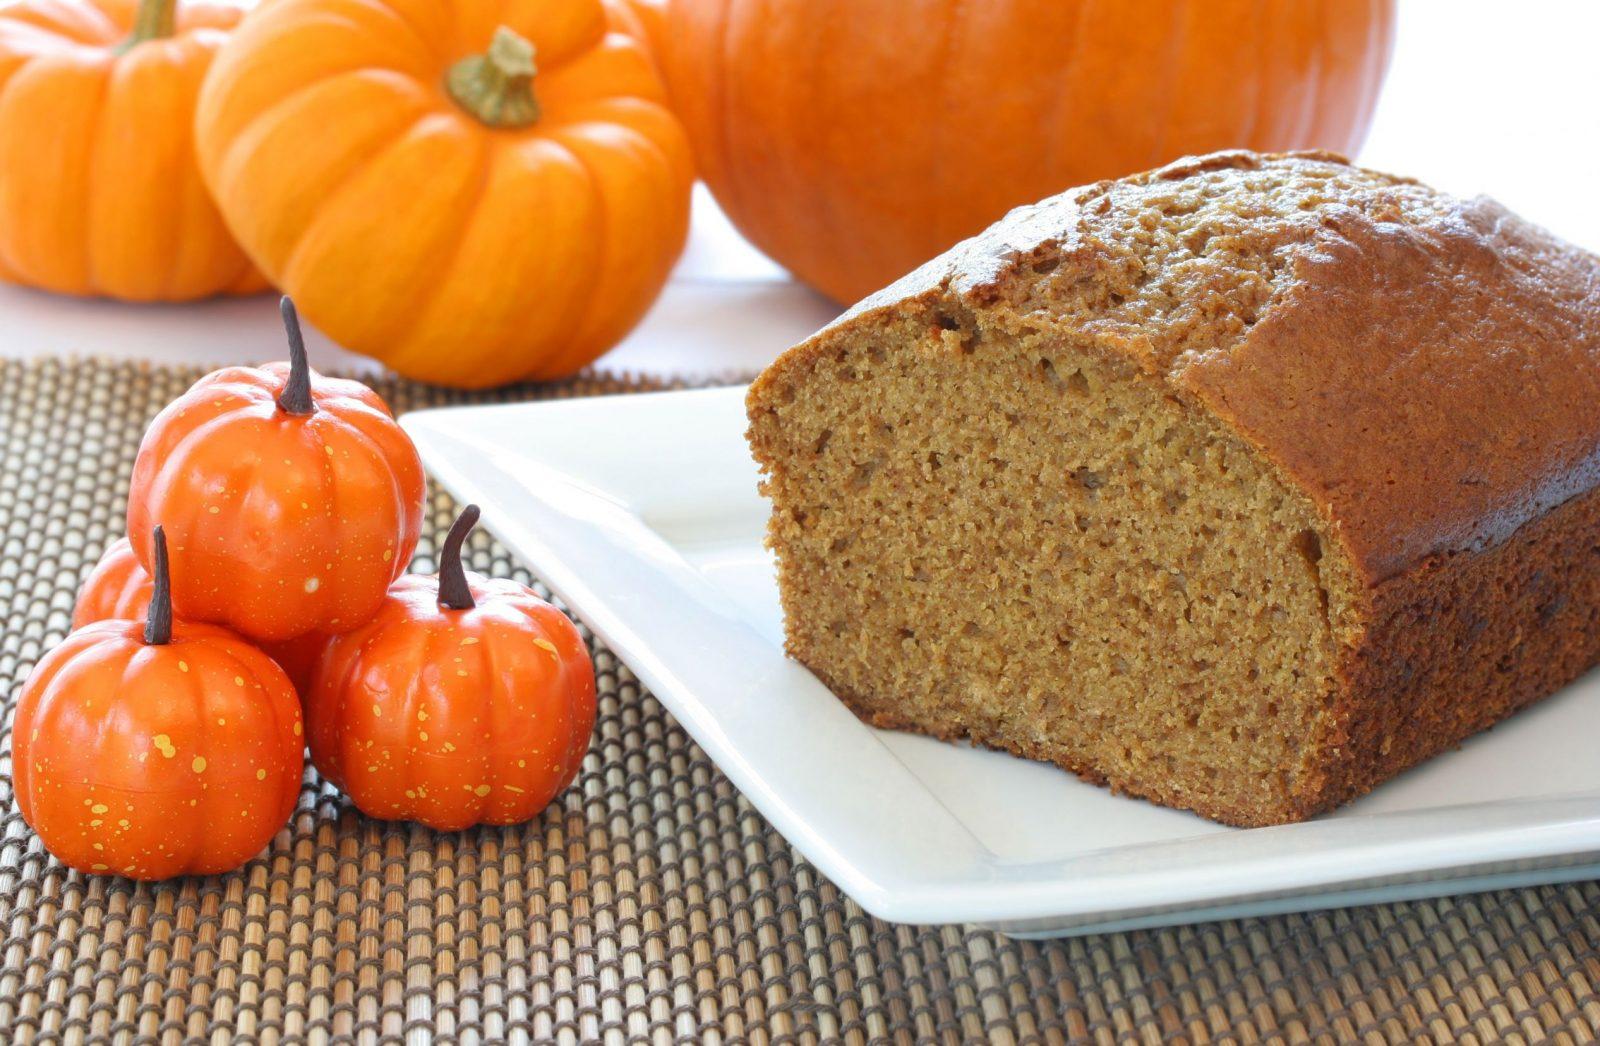 Napravite sami jesenji hleb od bundeve! (Recept)